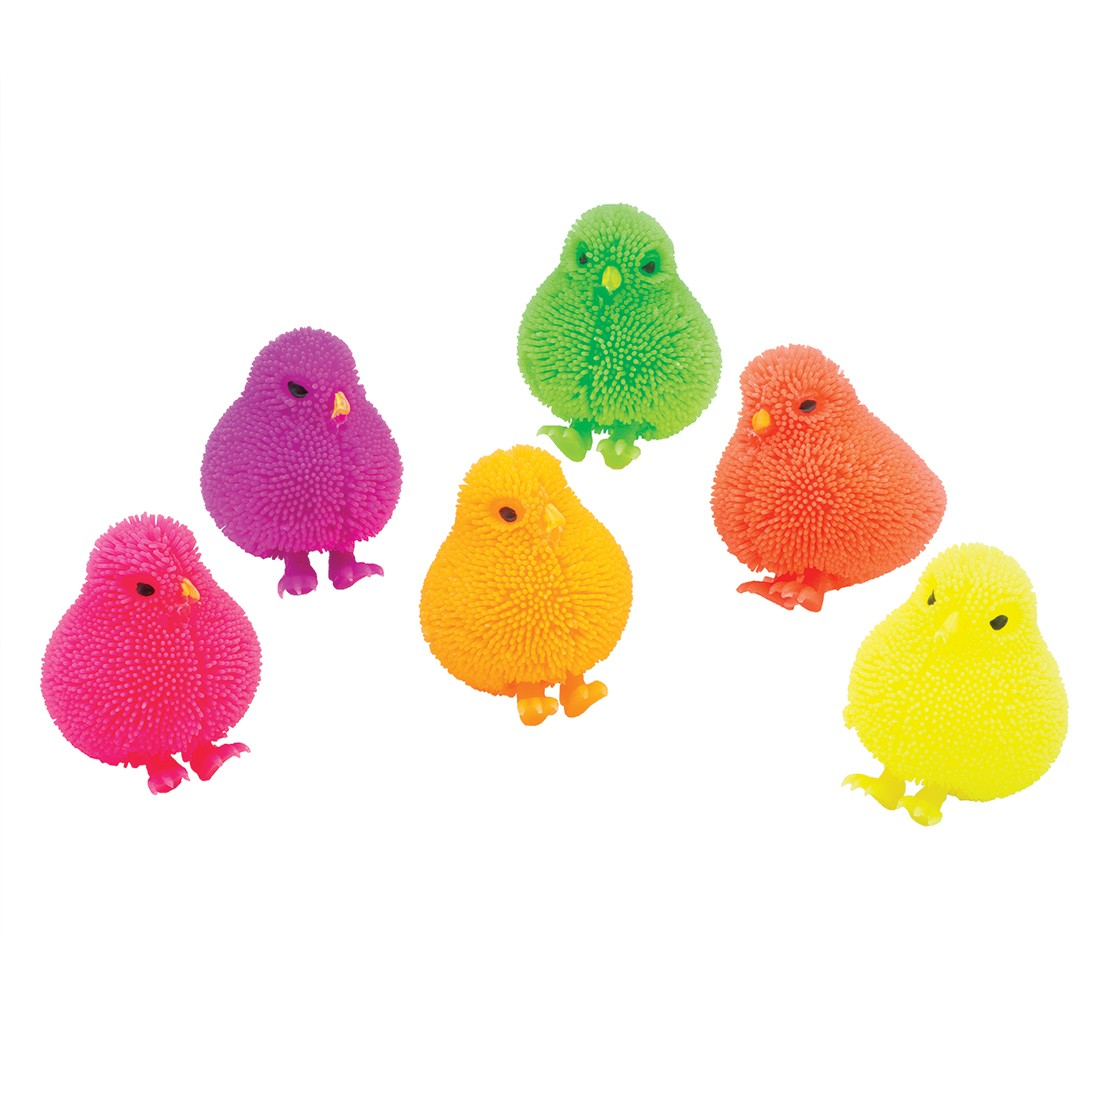 Puffy Chicks [image]